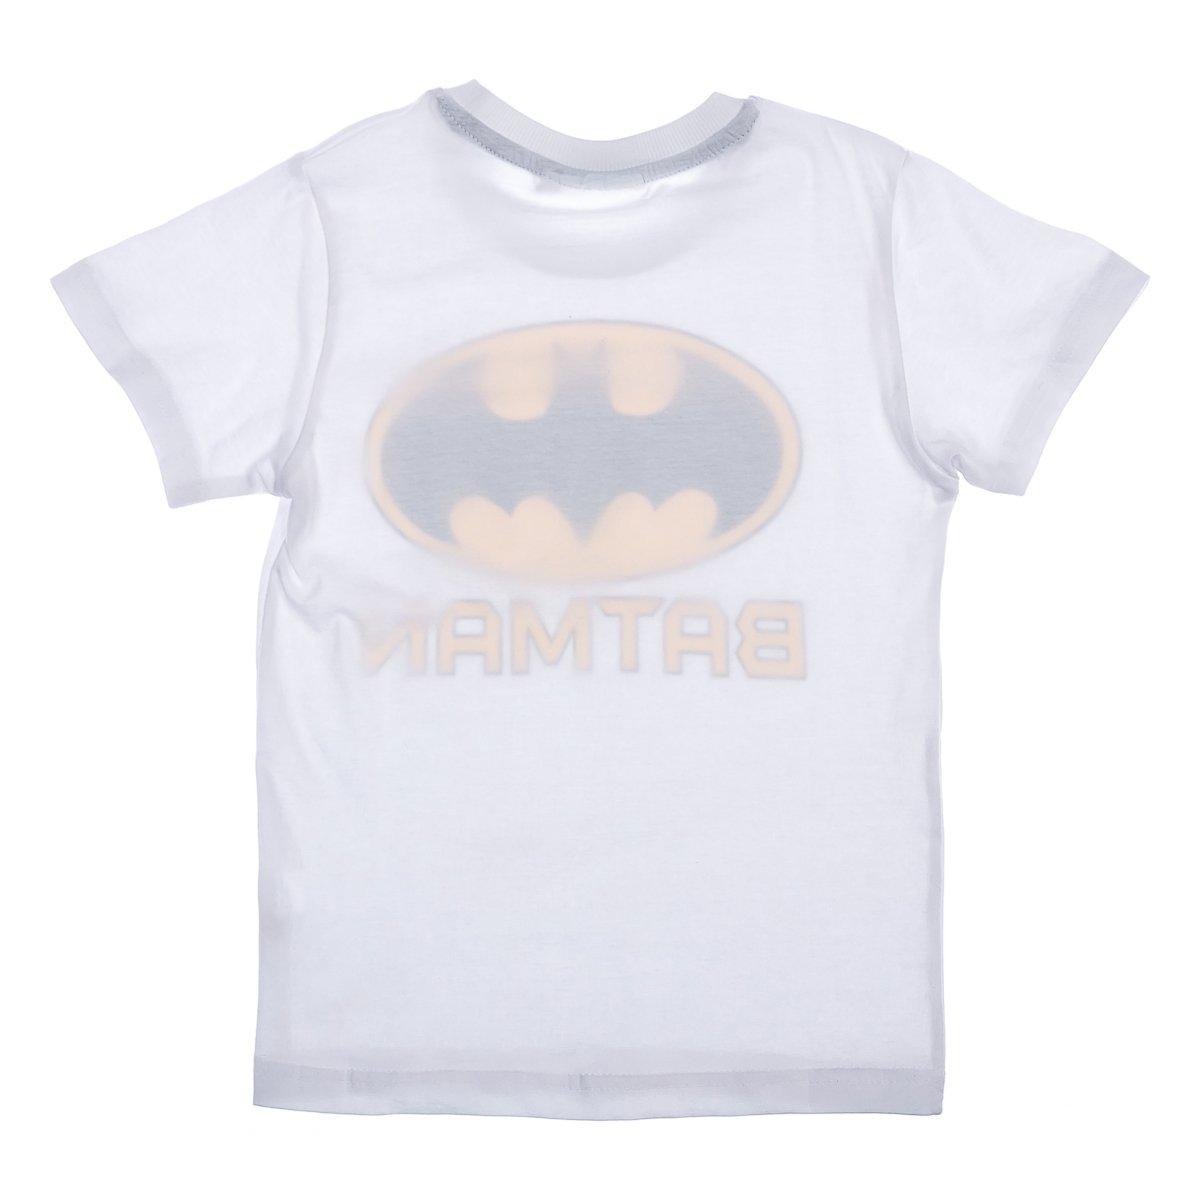 Купить Футболки, майки, топы, туники, Футболка E Plus M Batman White, р. 146 BAT5202184 ТМ: E Plus M, белый